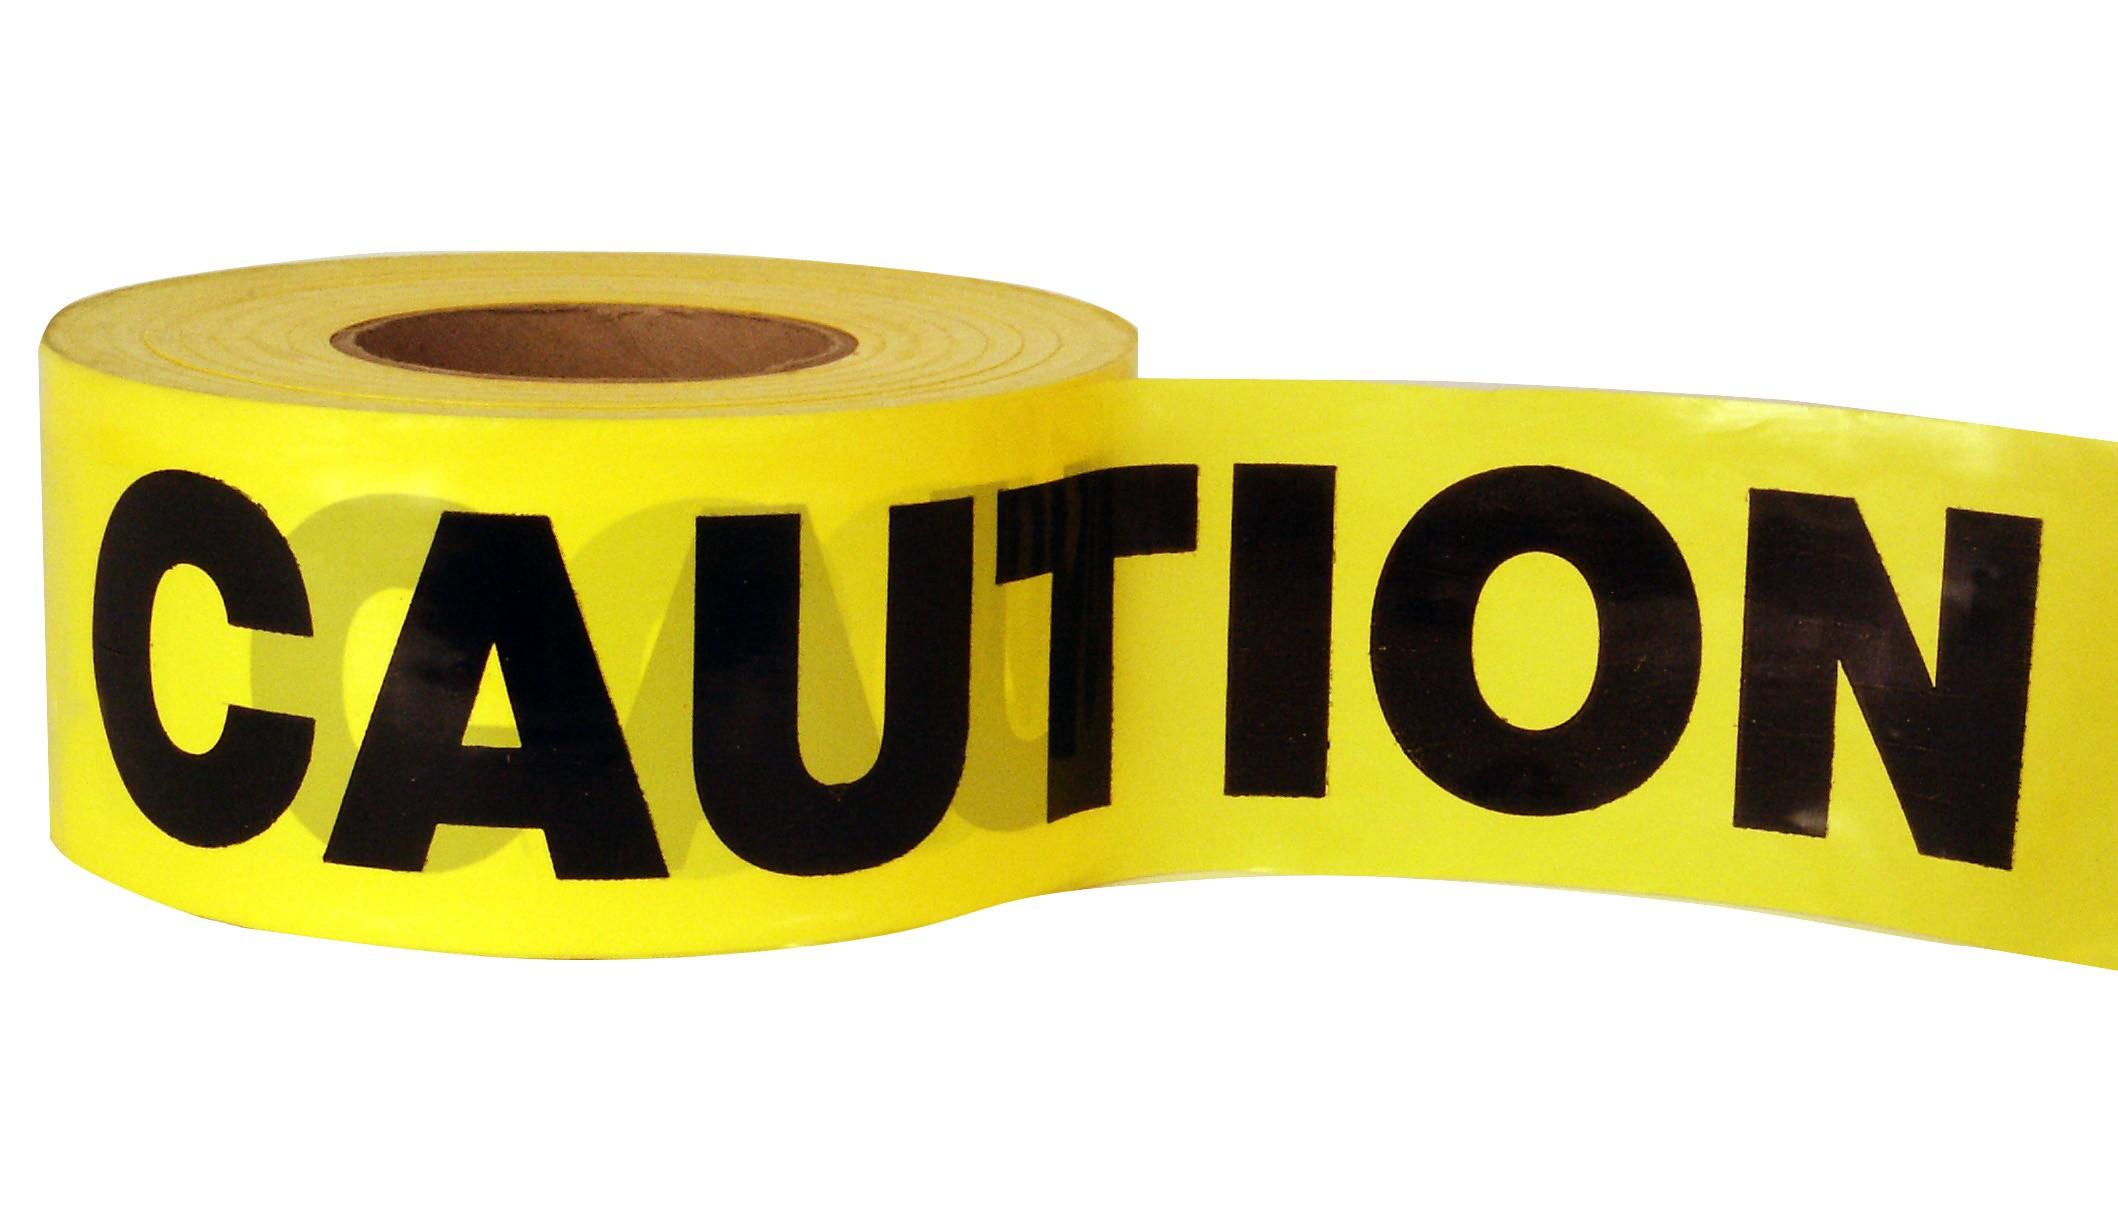 Under Construction Tape Background Free Barricades Clipar...